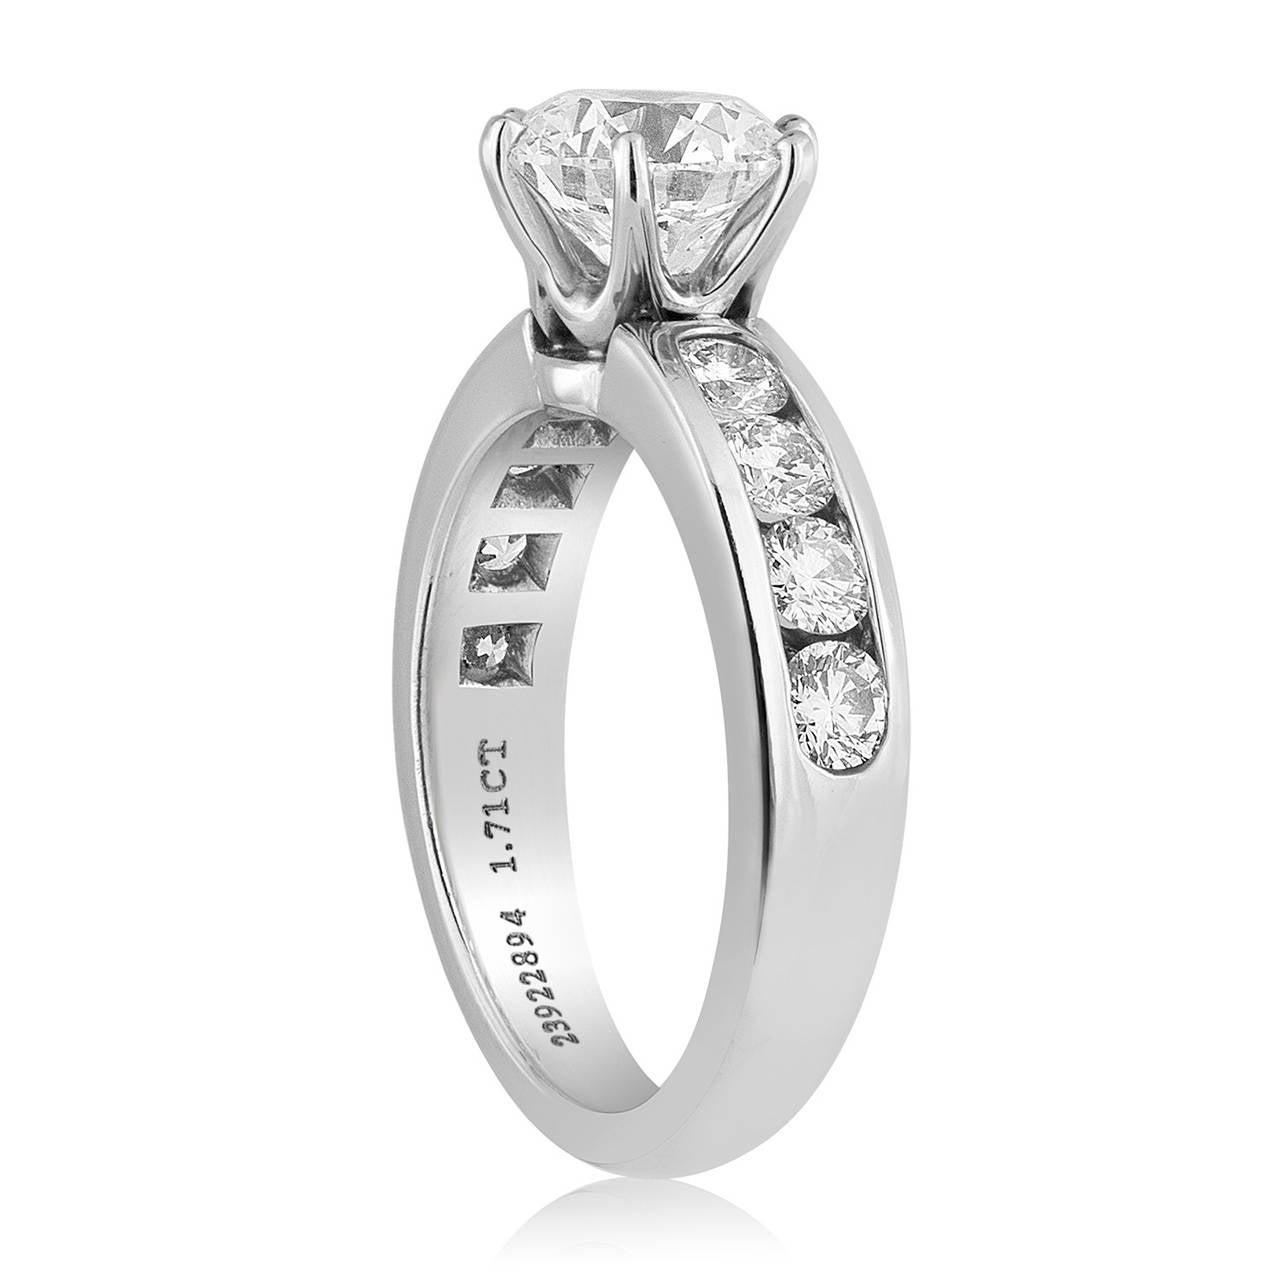 Tiffany & Co. 1.71 Carat F IF Diamond Platinum Ring 2